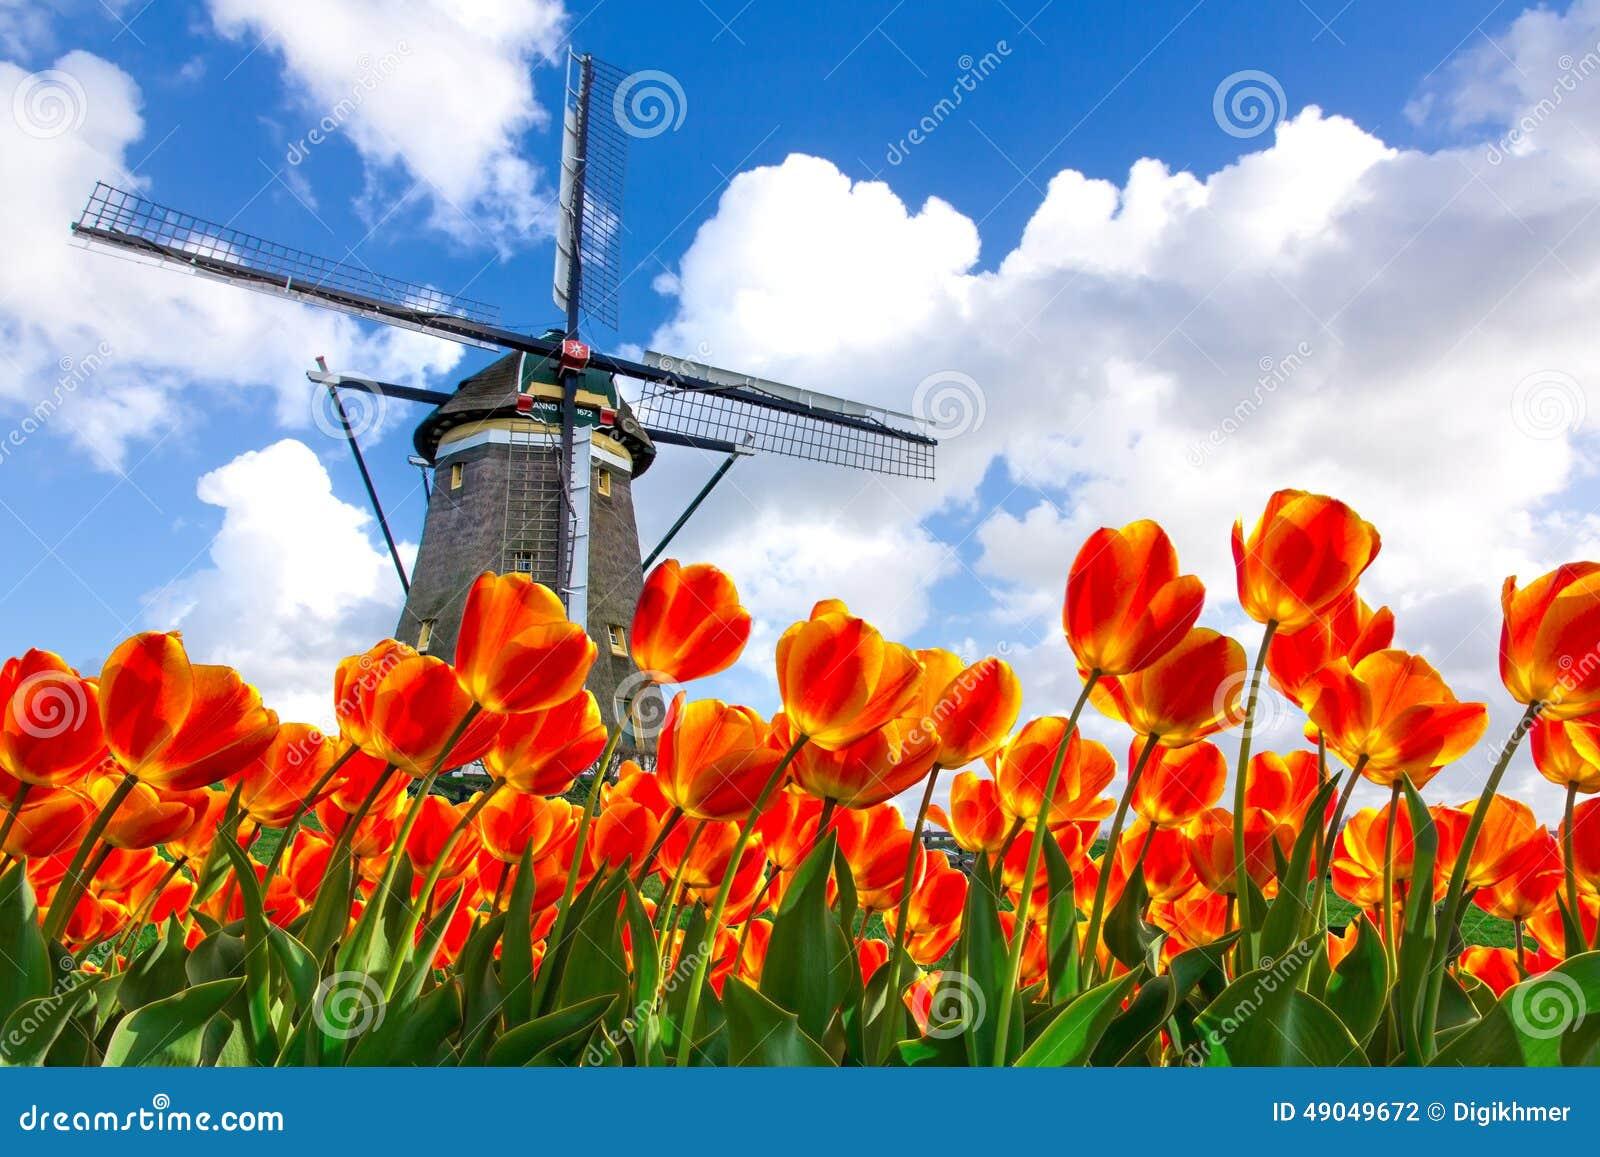 голландская ветрянка тюльпана ландшафта